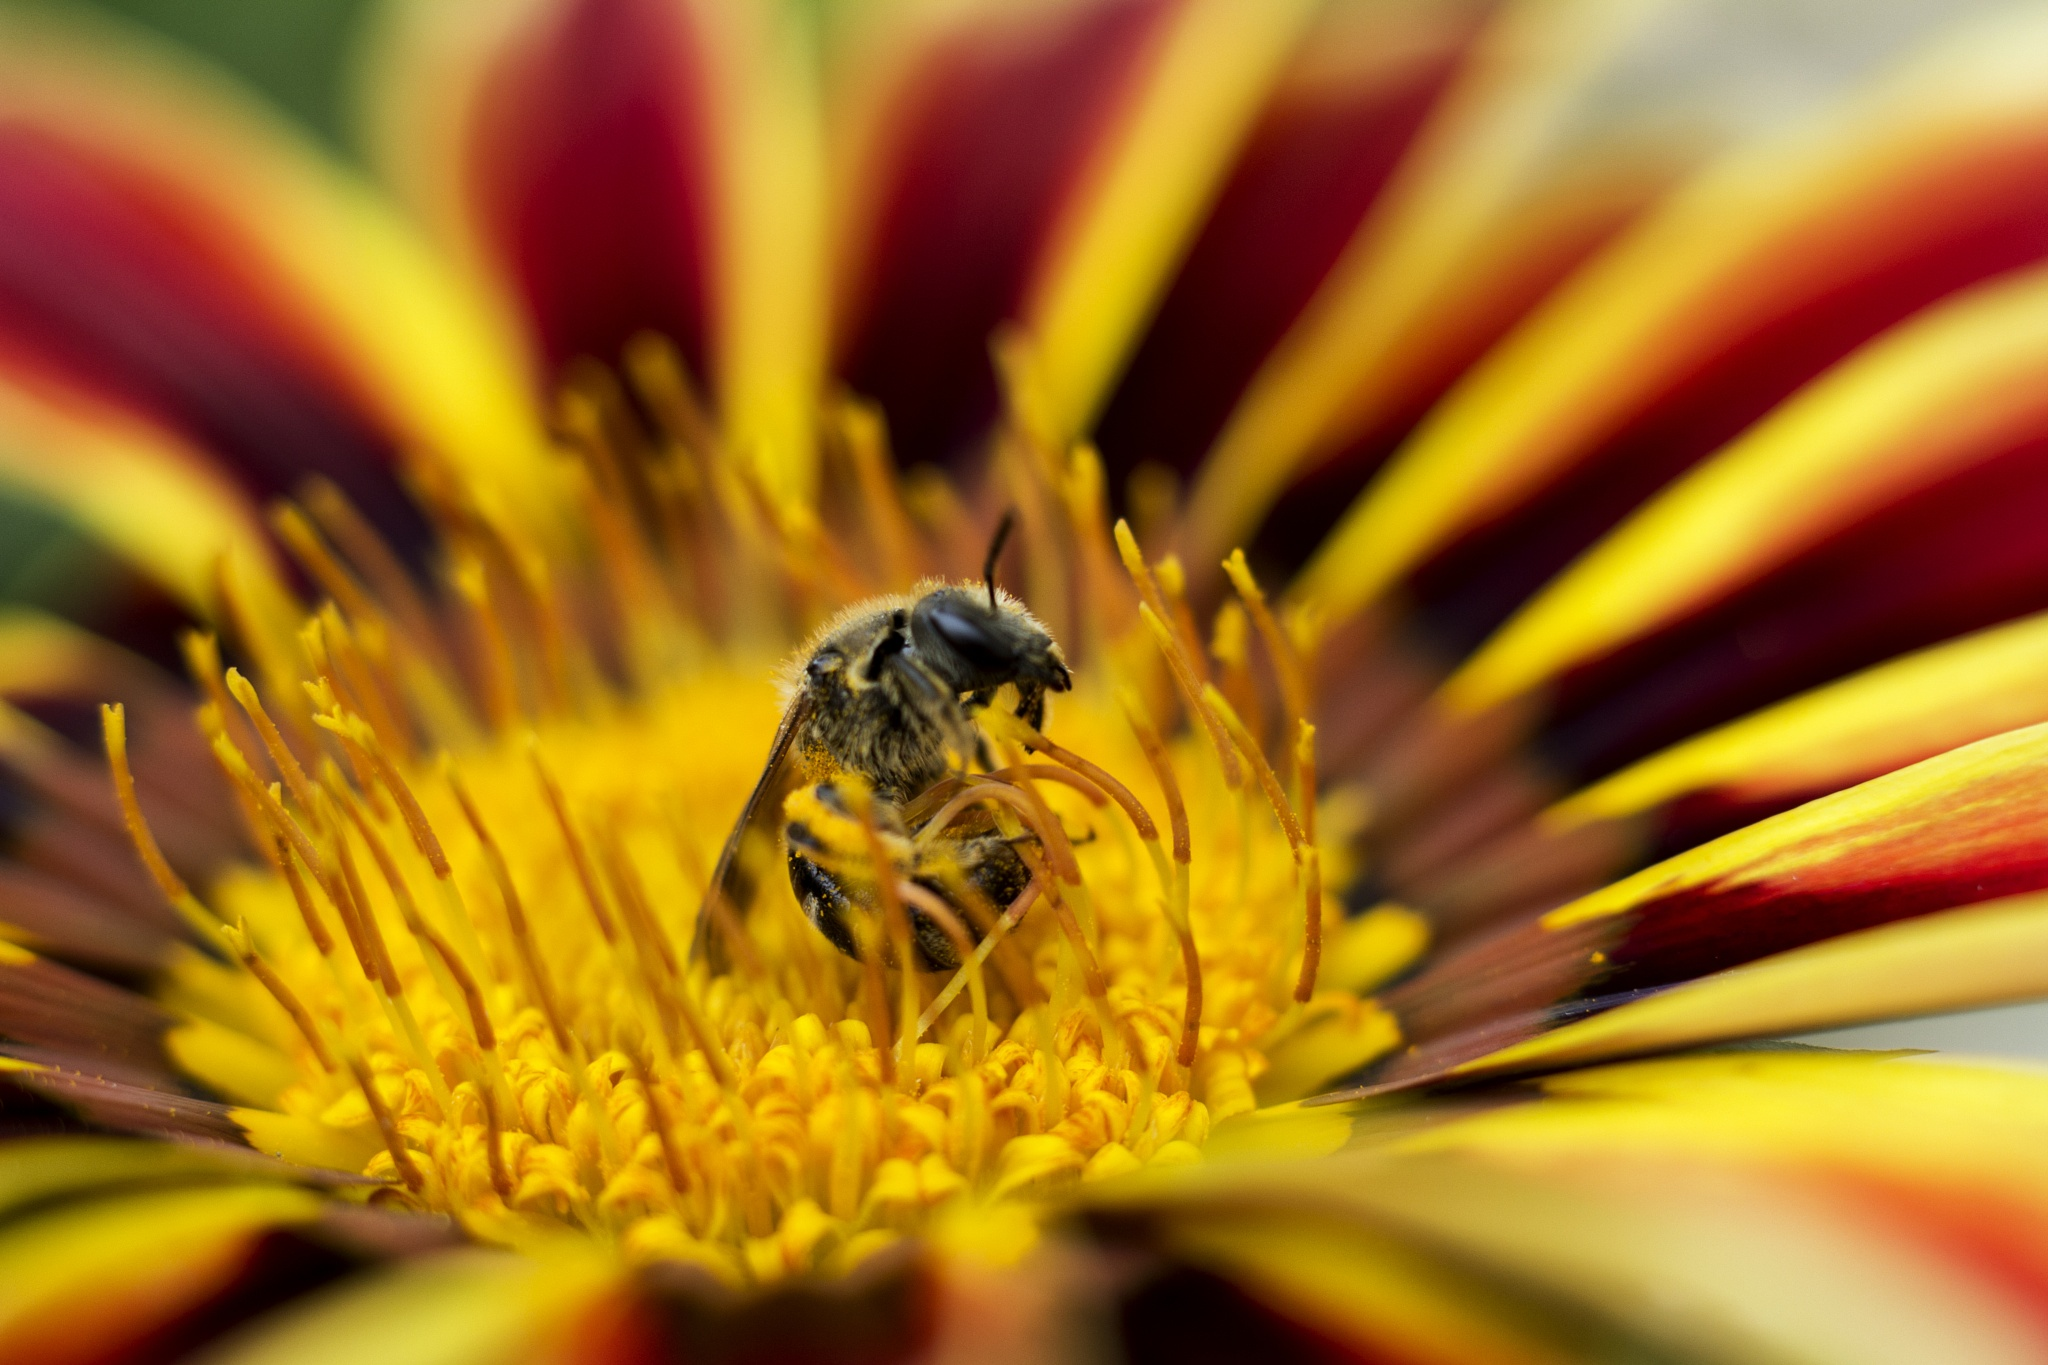 Happened To Bee by Scott Hryciuk